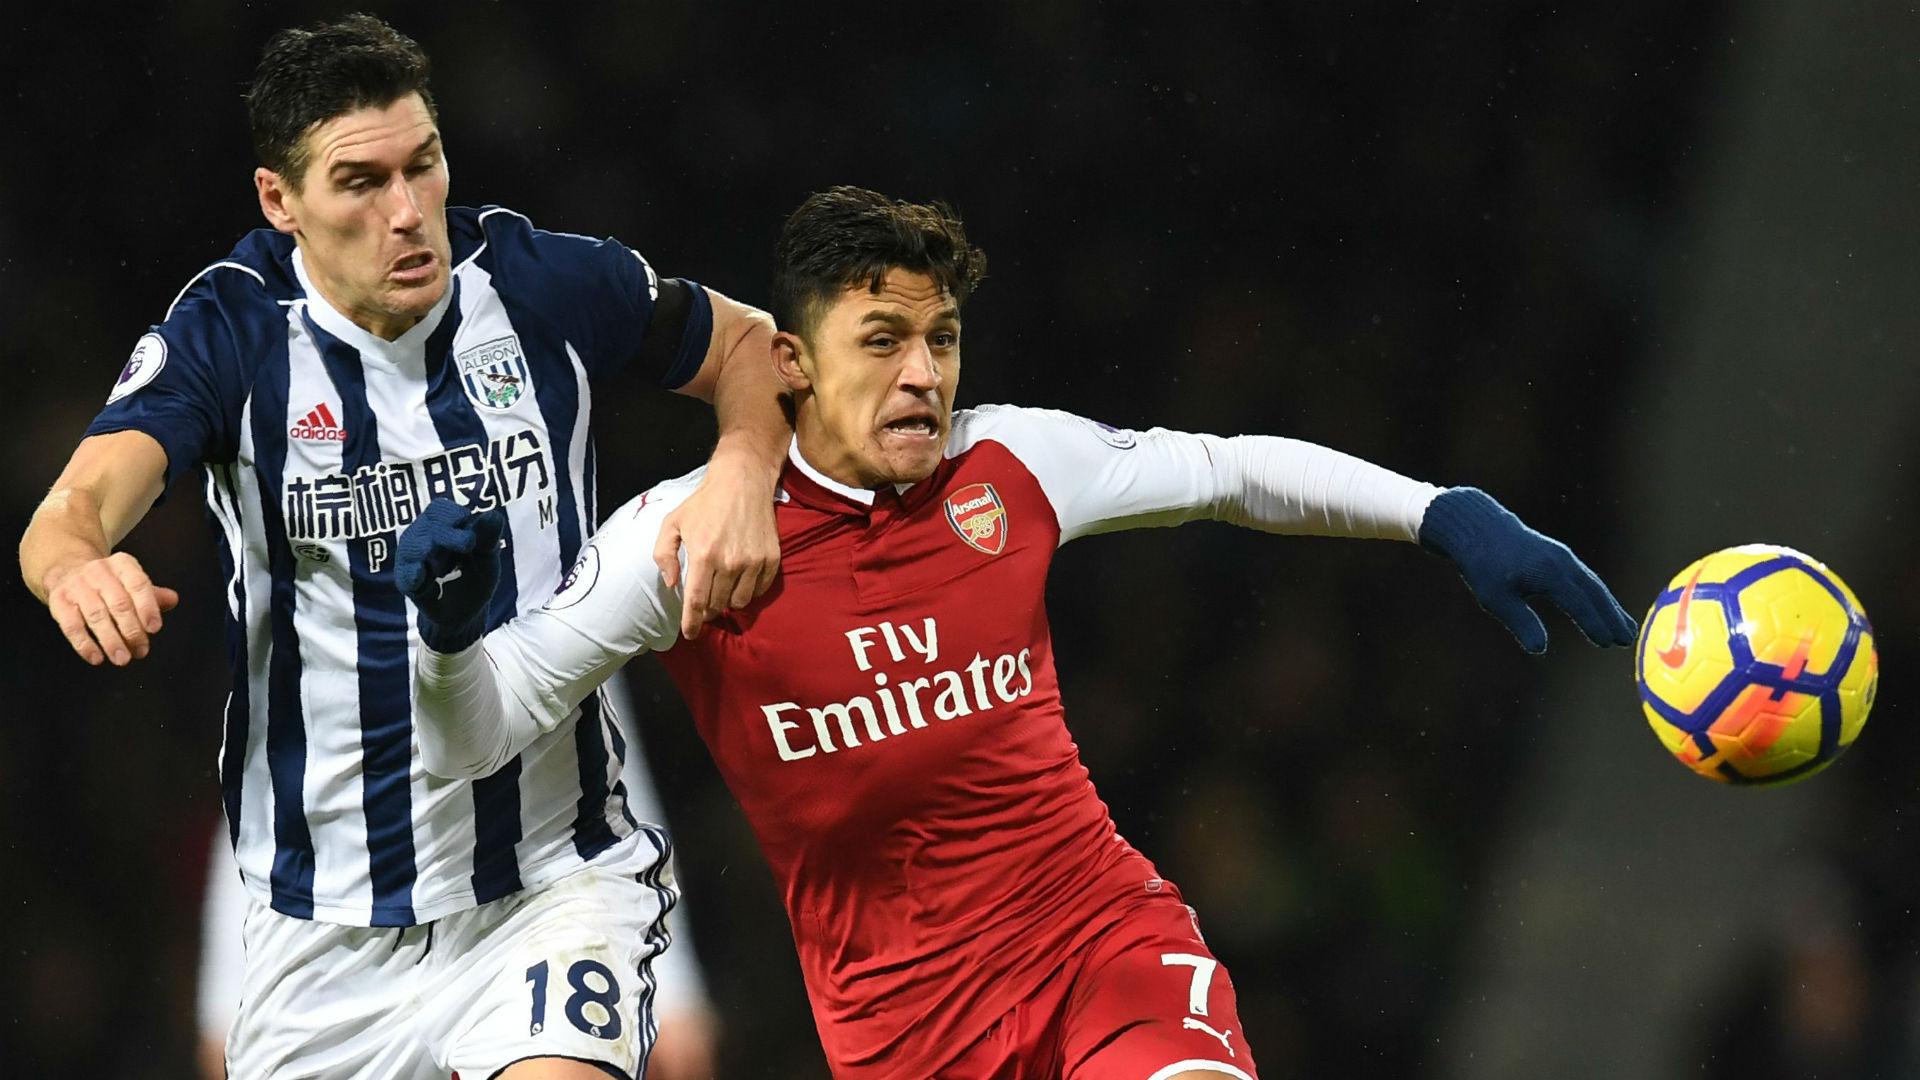 Gareth Barry West Brom Alexis Sanchez Arsenal